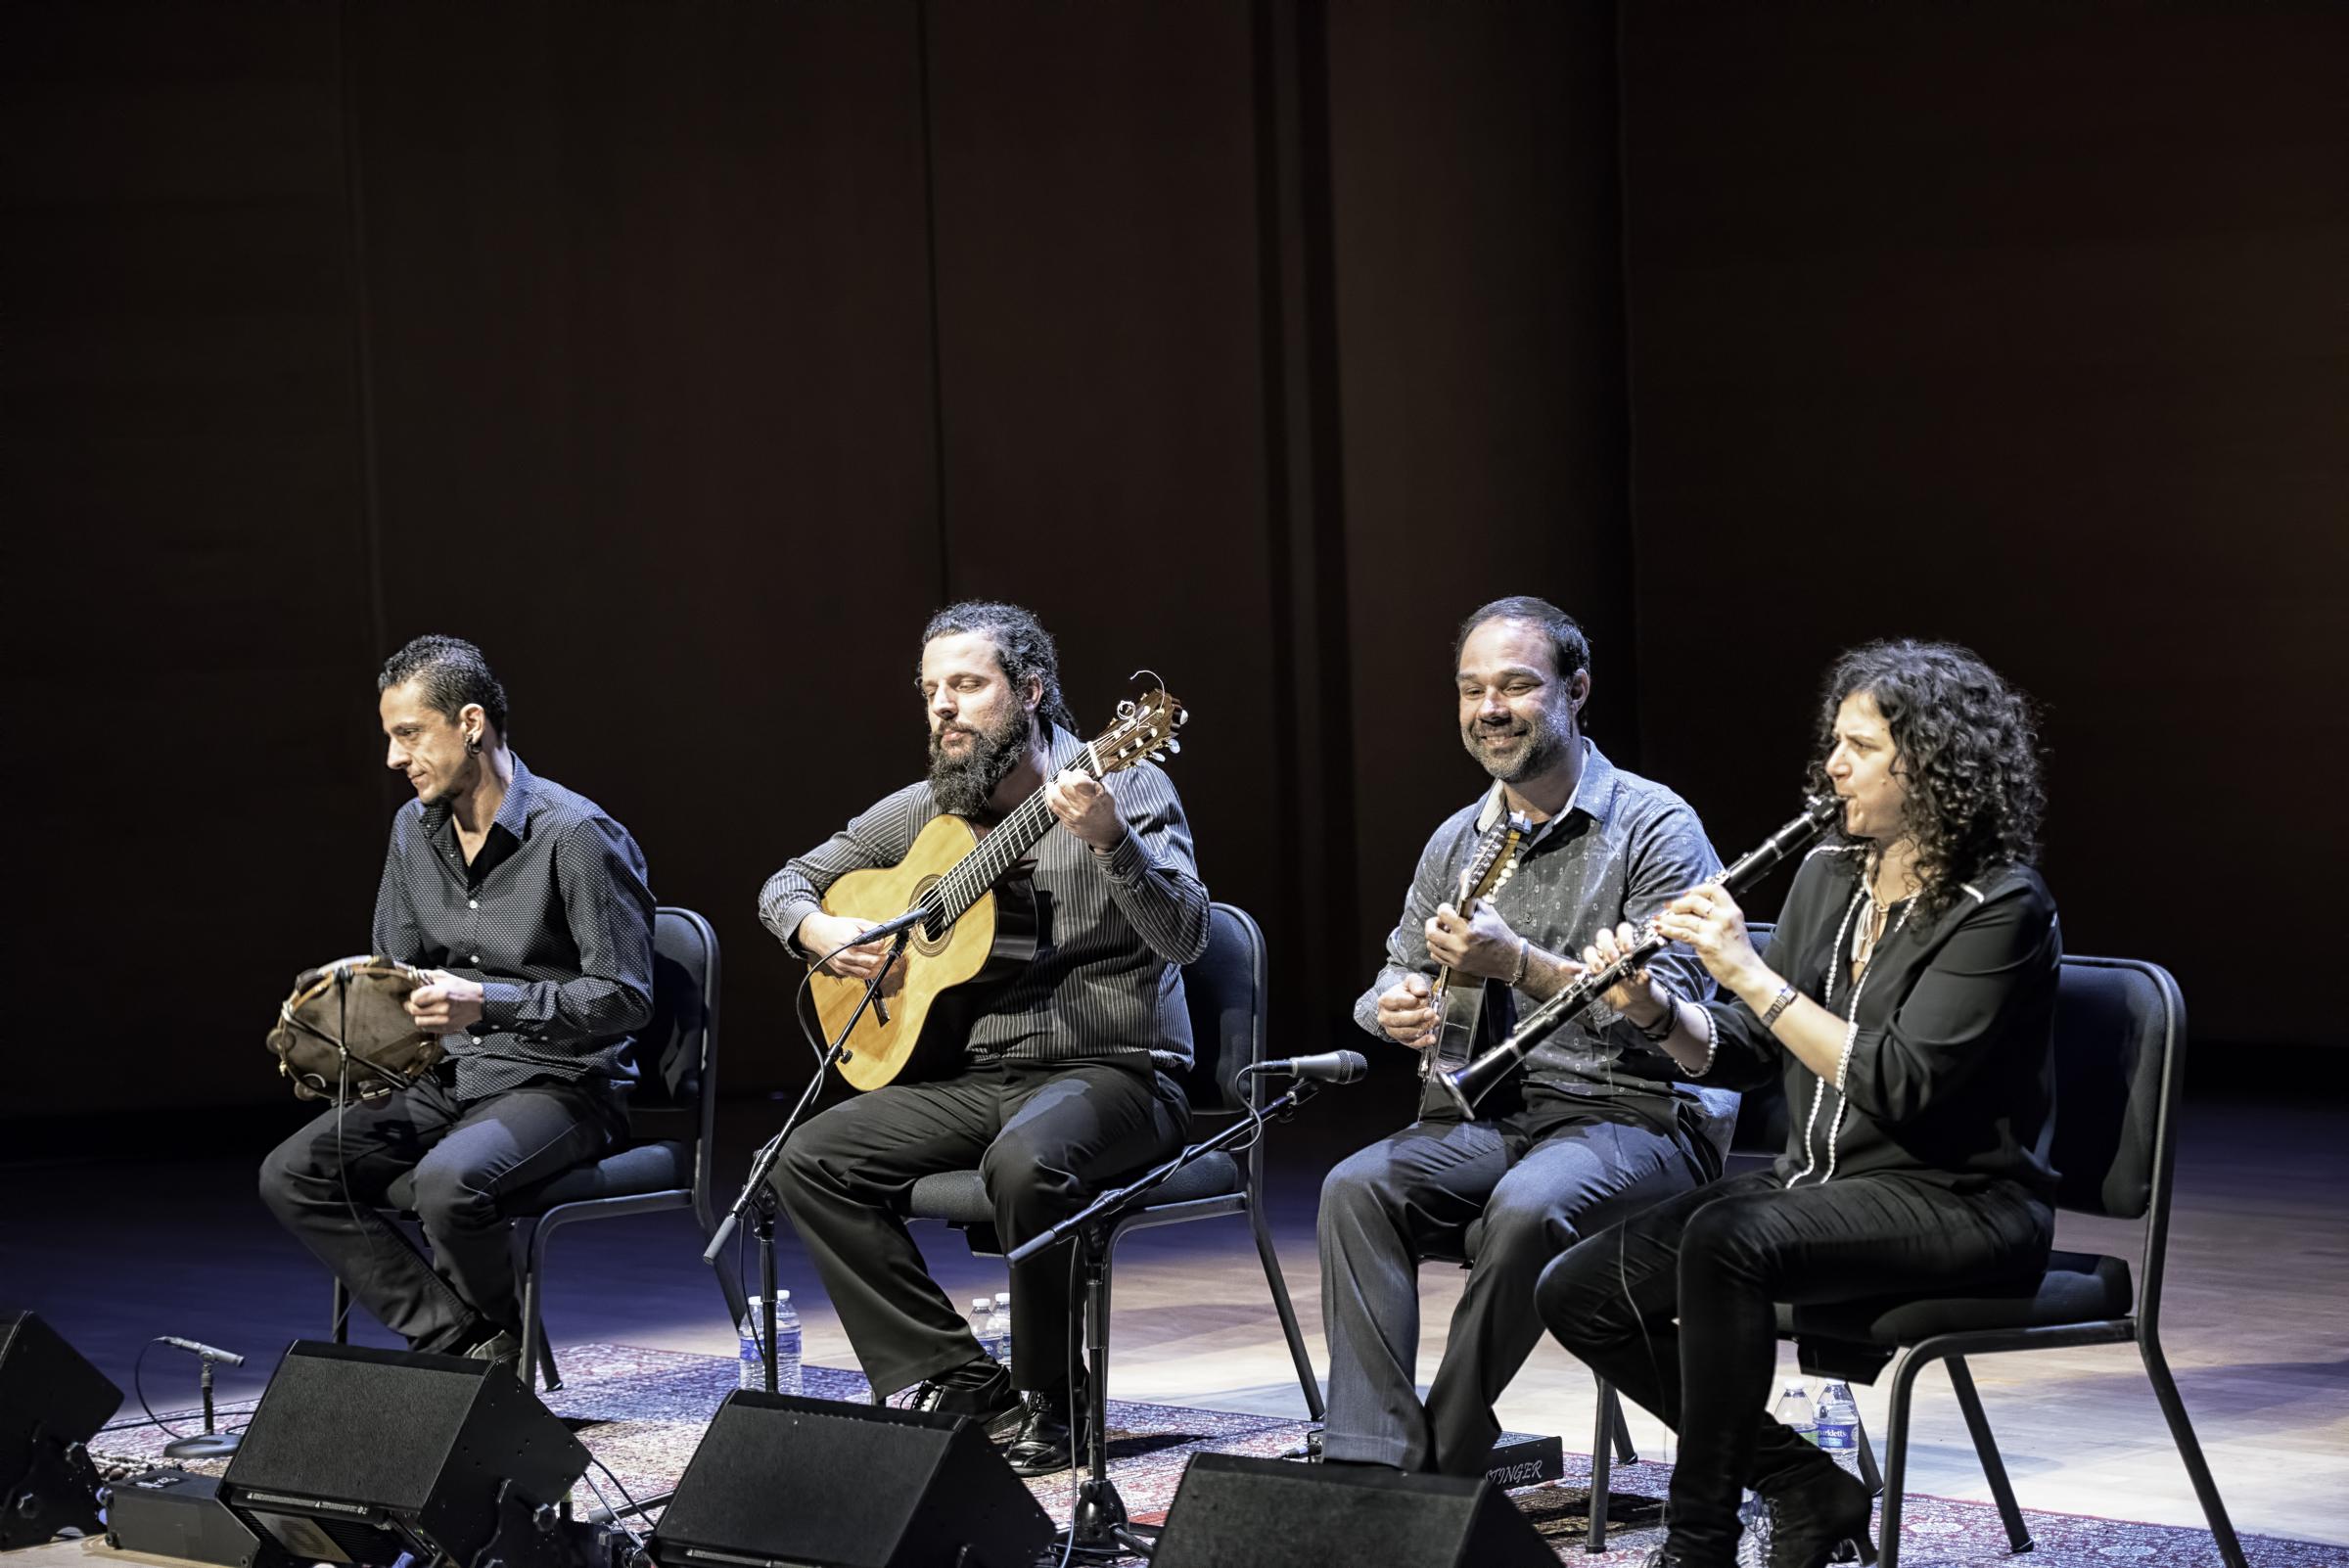 Alexandre Lora, Douglas Lora, Dudu Maia And Anat Cohen With Trio Brasileiro At The Musical Instrument Museum (mim) In Phoenix